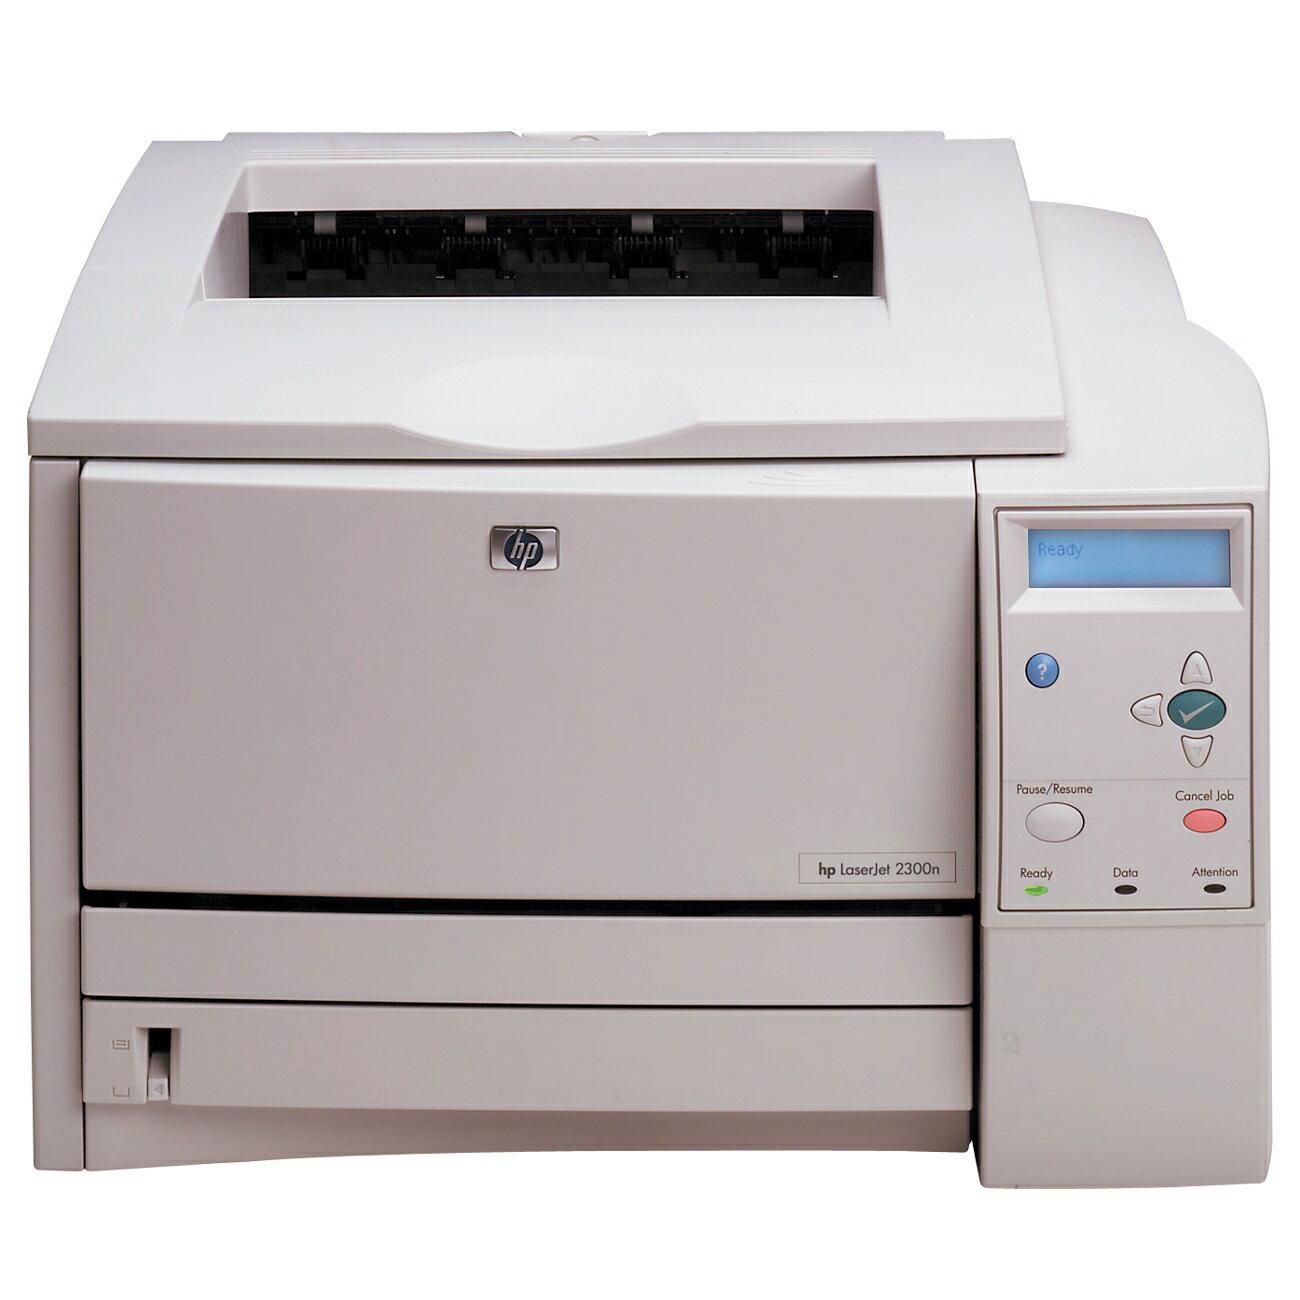 HP LaserJet 2300N Laser Printer - Monochrome - 1200 x 1200 dpi Print - Plain Paper Print - Desktop - 25 ppm Mono Print - Letter, Legal, Executive, Custom Size, Letter - 700 sheets Standard Input Capacity - 50000 Duty Cycle - Manual Duplex Print - Ethernet 0